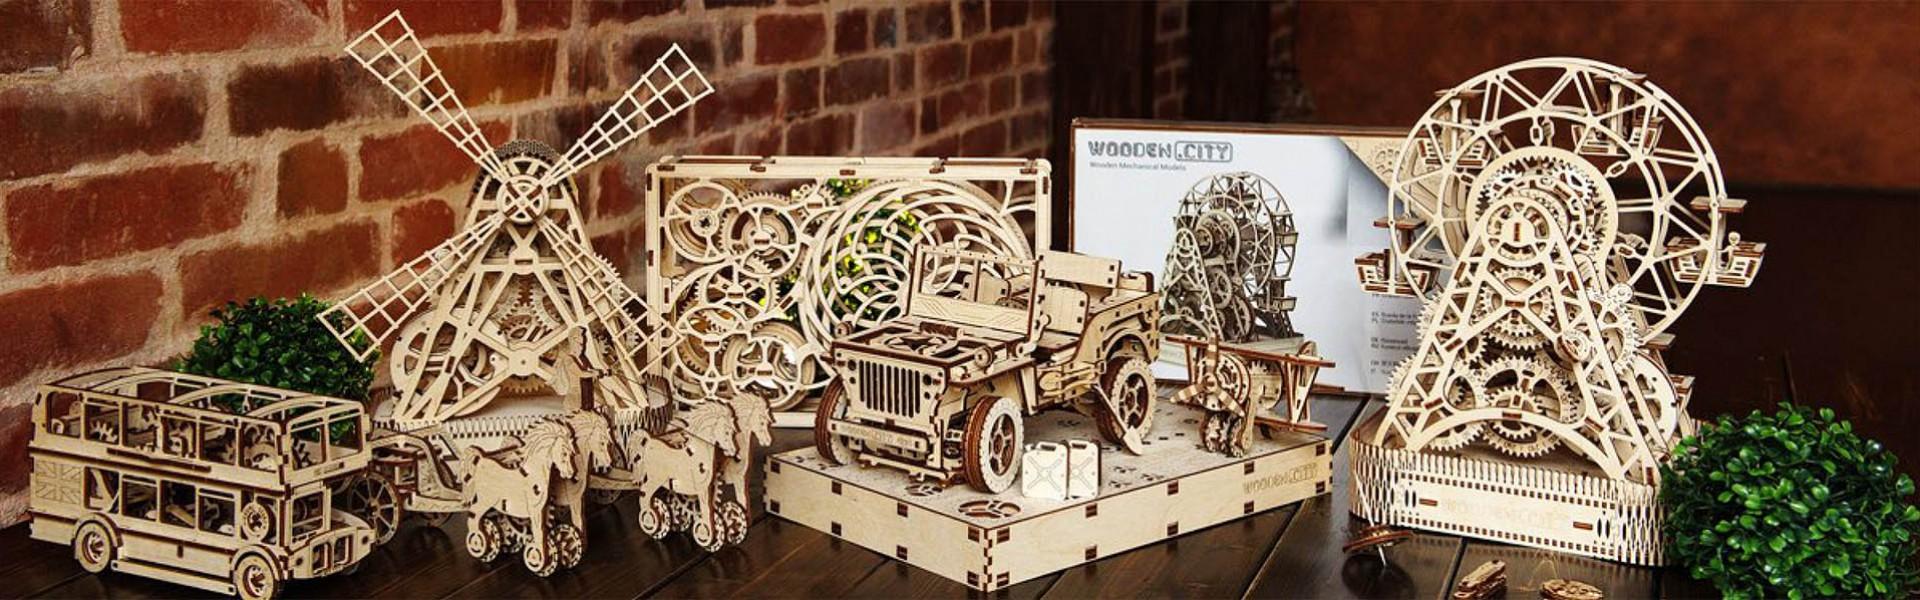 houten bouwpakketten van wooden city